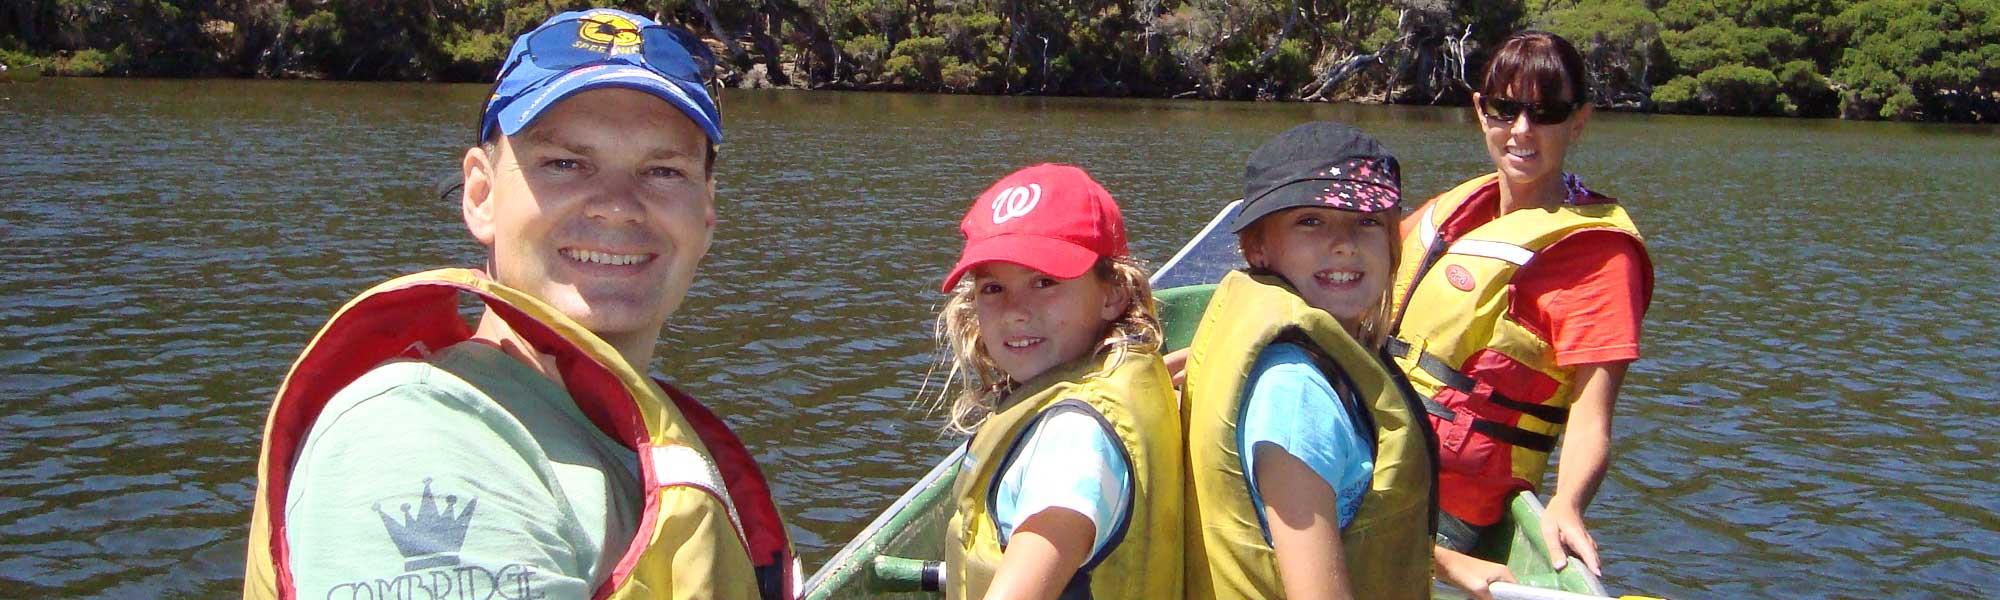 CanoeTourFamily